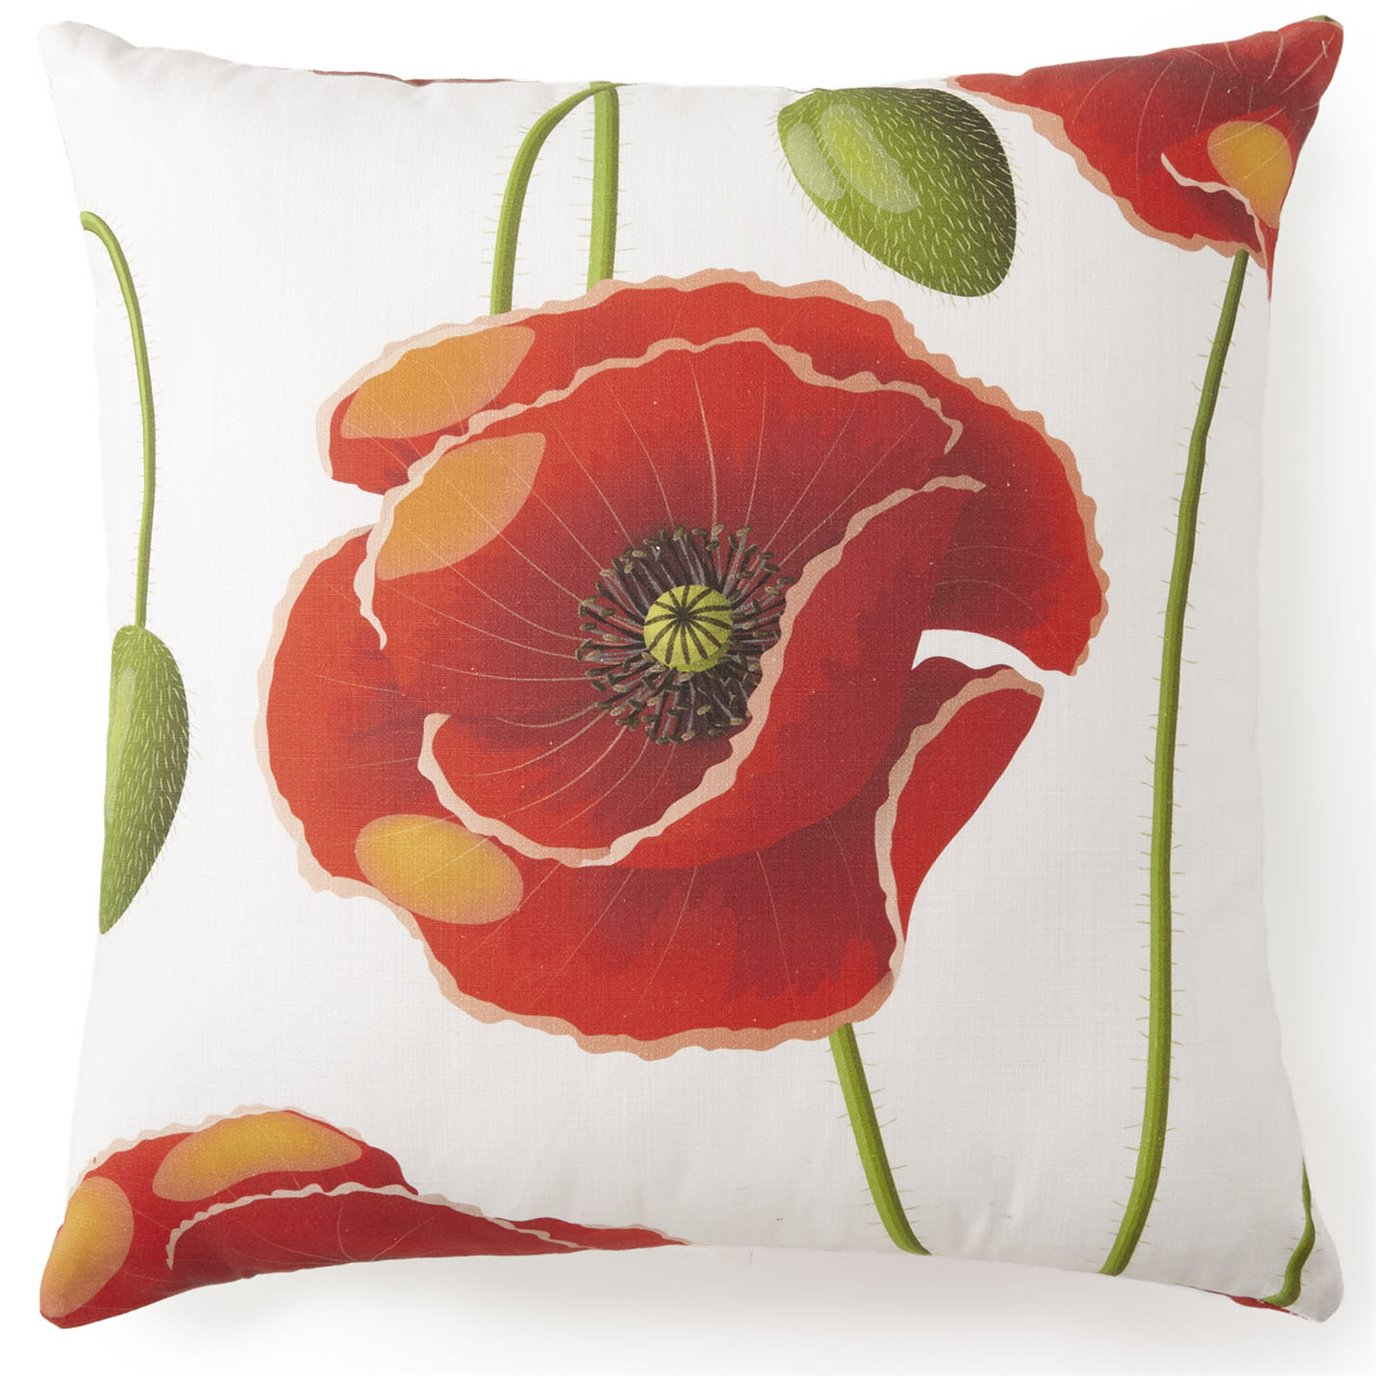 "Poppy Plaid Square Pillow 20""x20"" - Poppy Pattern"